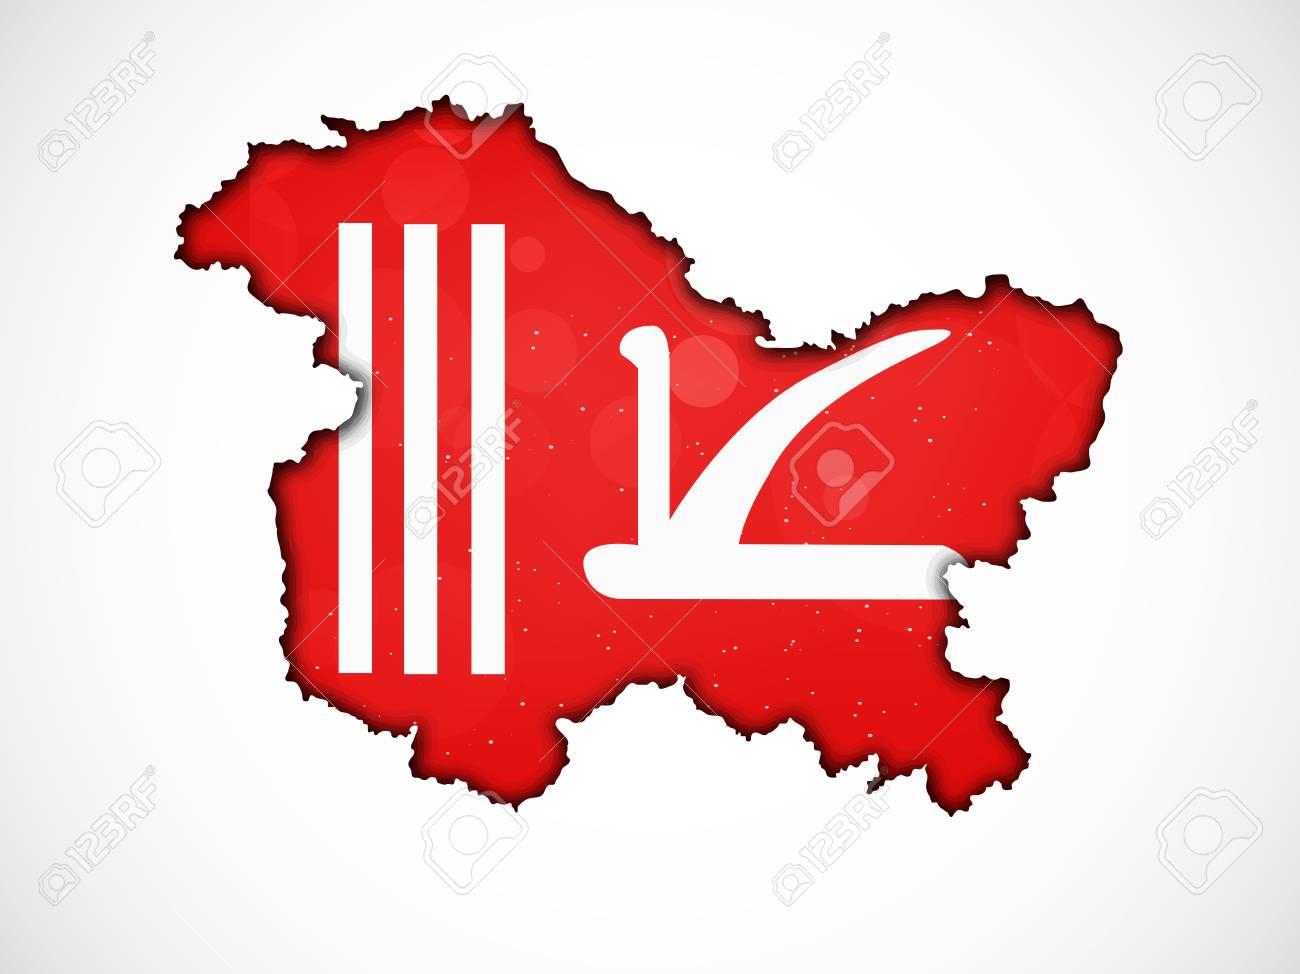 map jammu and kashmir flag Illustration Of Indian State Jammu Kashmir Flag With Map Royalty map jammu and kashmir flag